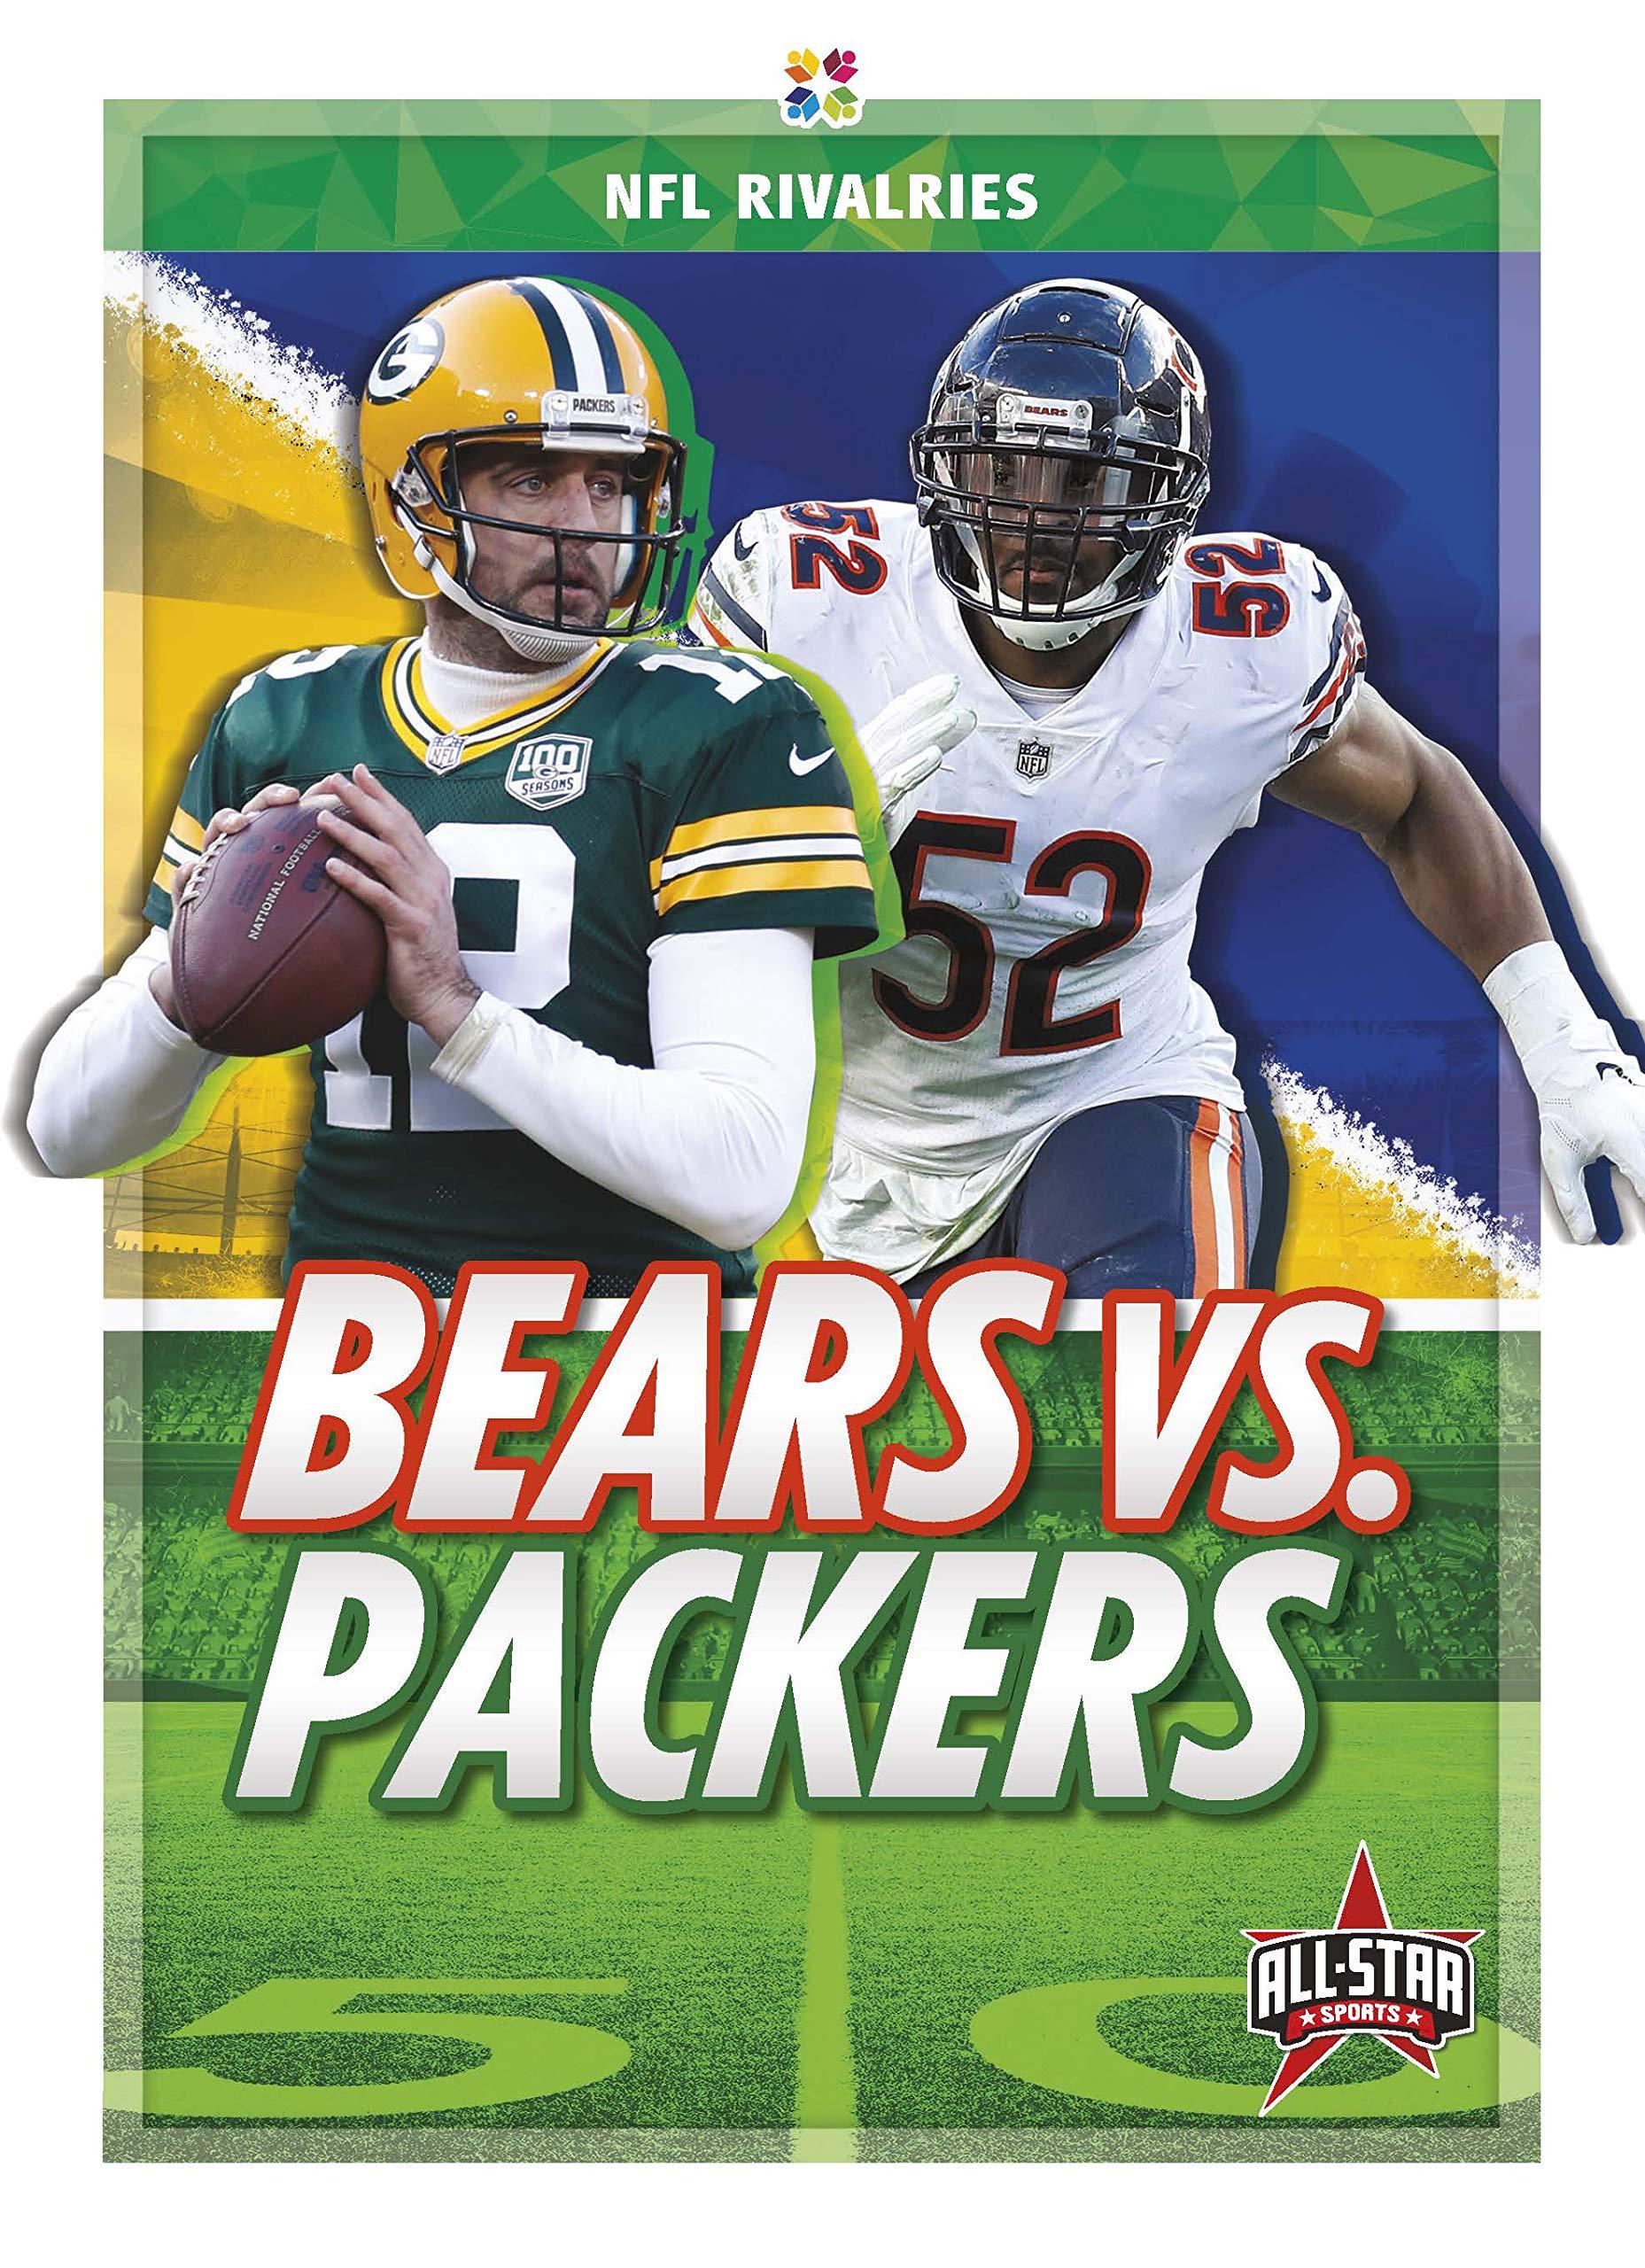 Bears Vs Packers Nfl Rivalries Anthony K Hewson 9781644941645 Amazon Com Books